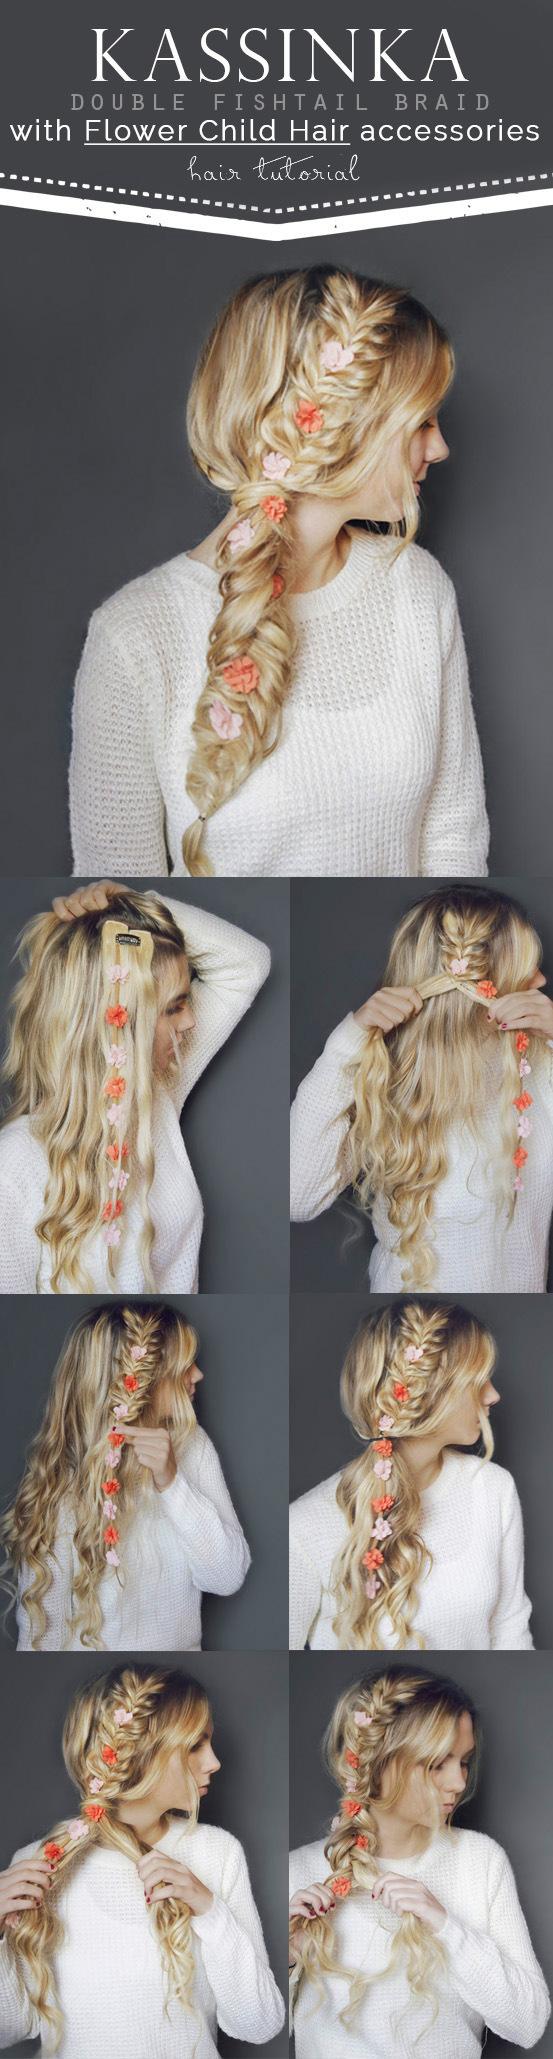 hair7